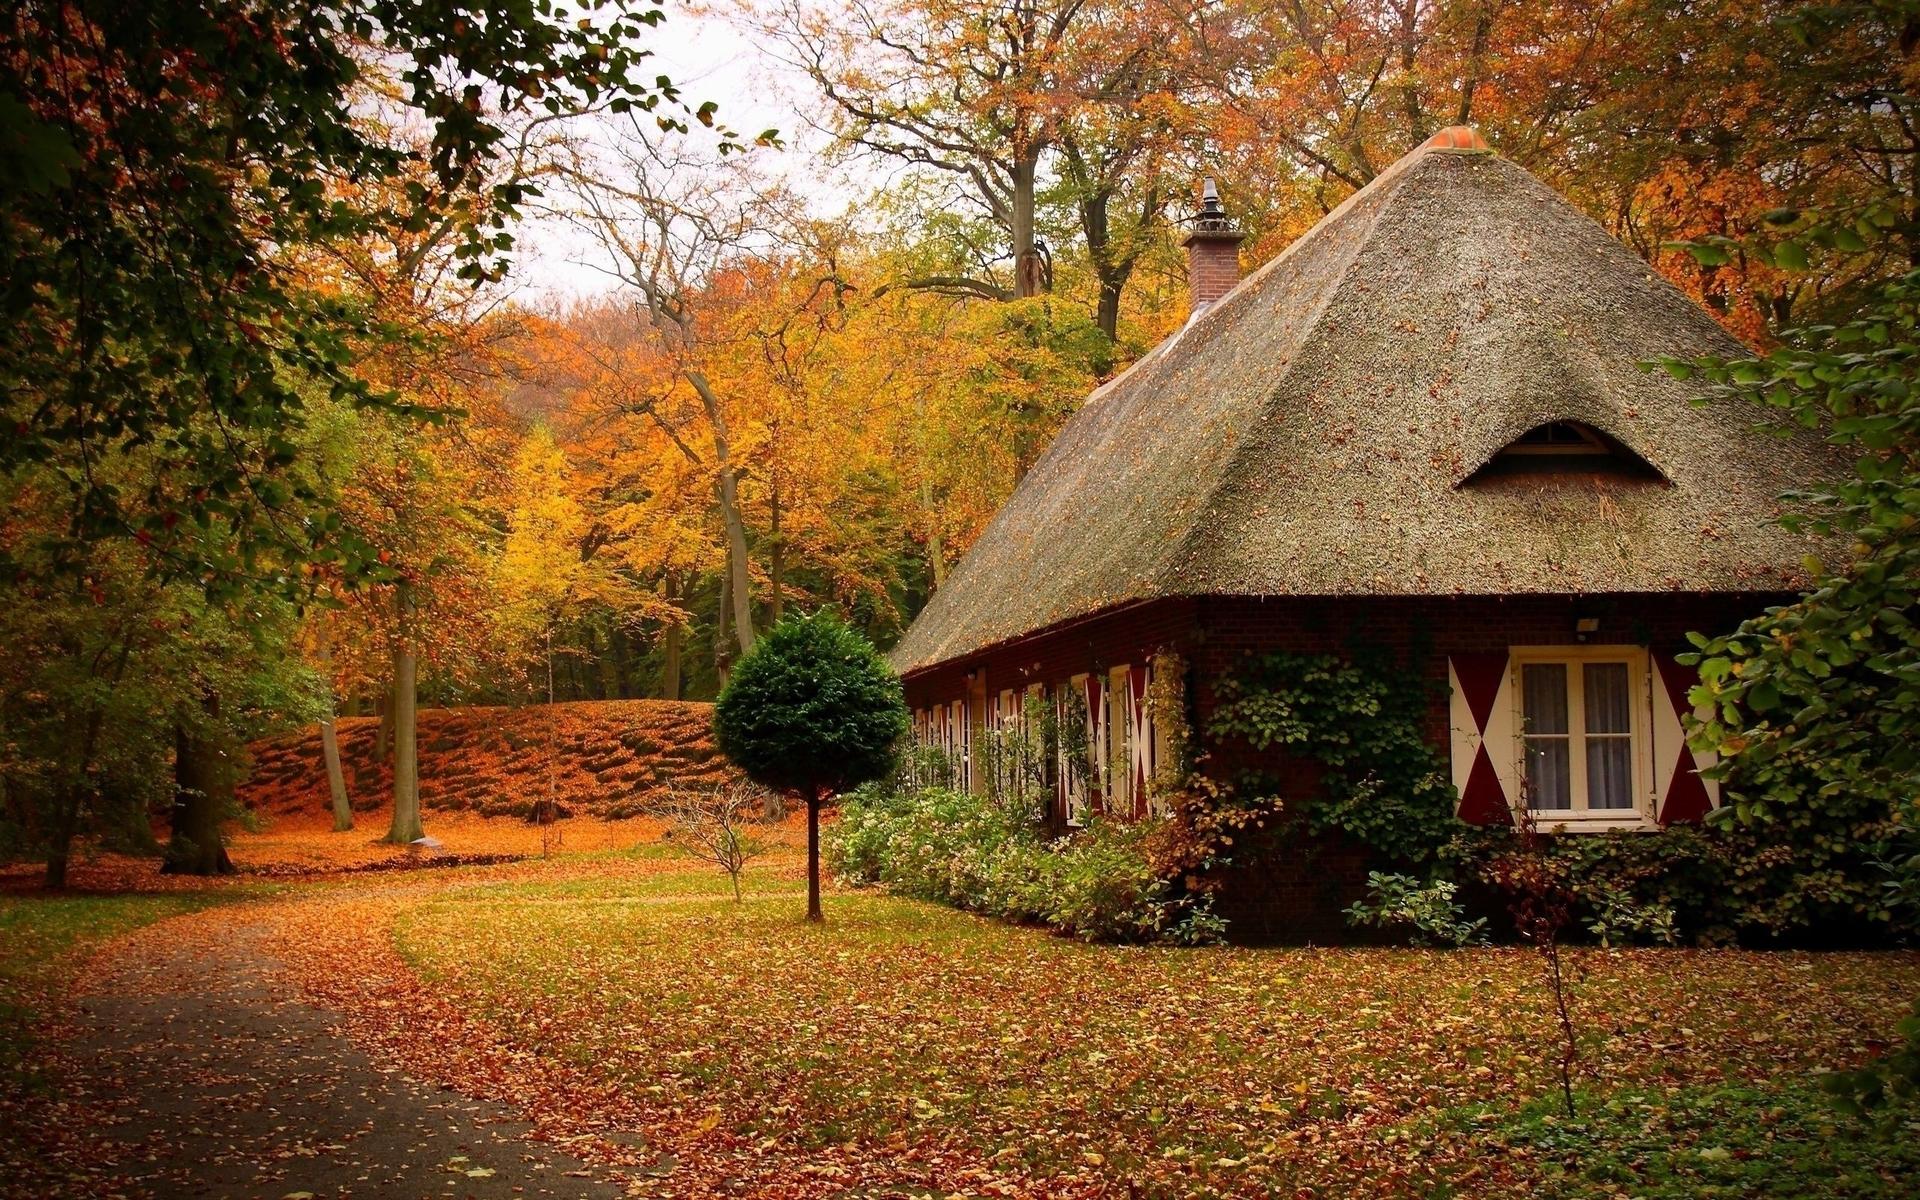 Download Autumn season wallpaperdesktop background in 1920x1200 1920x1200